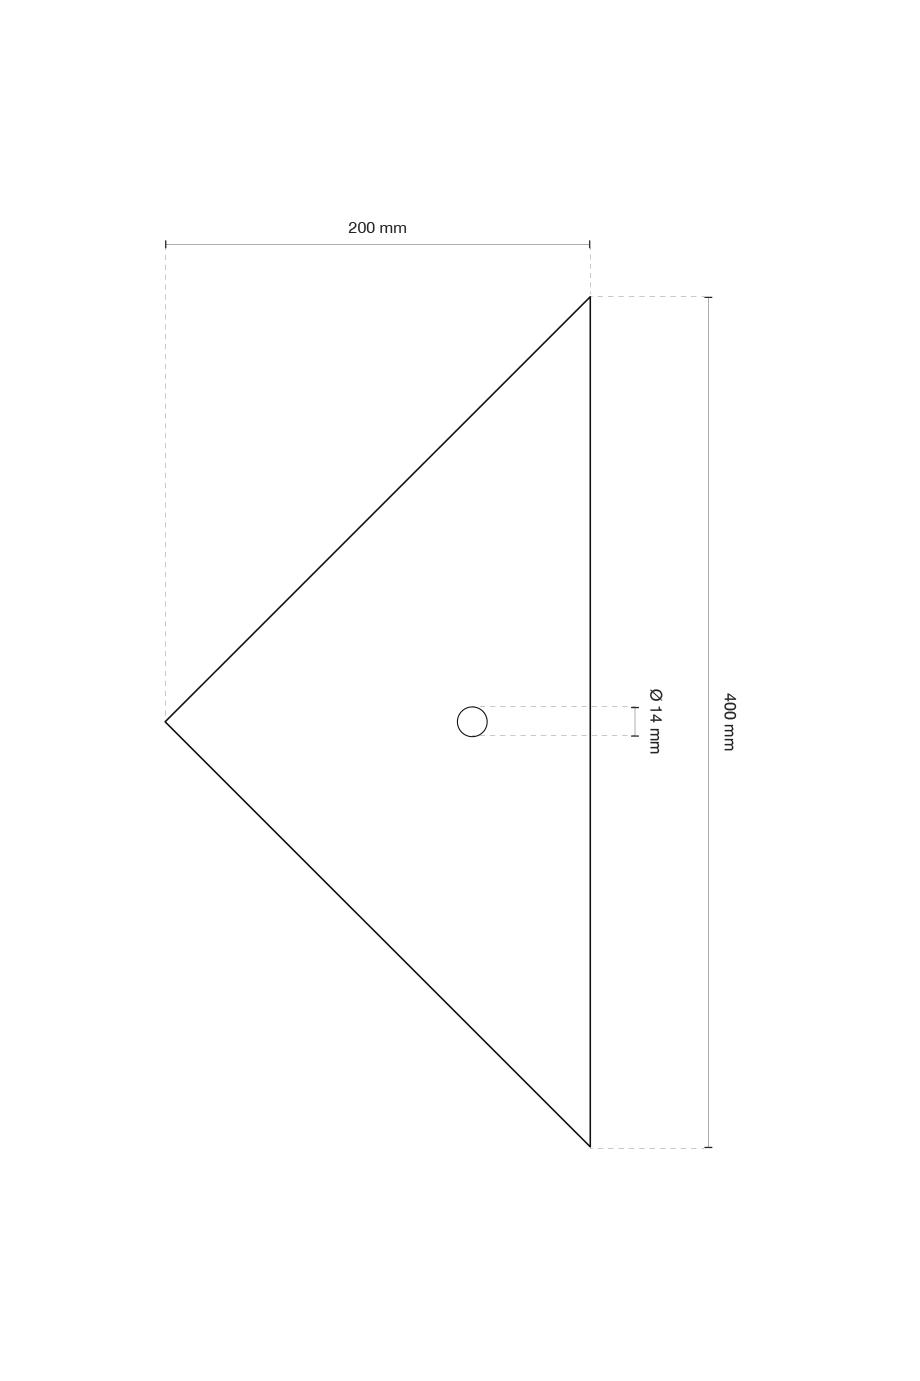 bitpart-dimensions-backplate-triangle.jpg